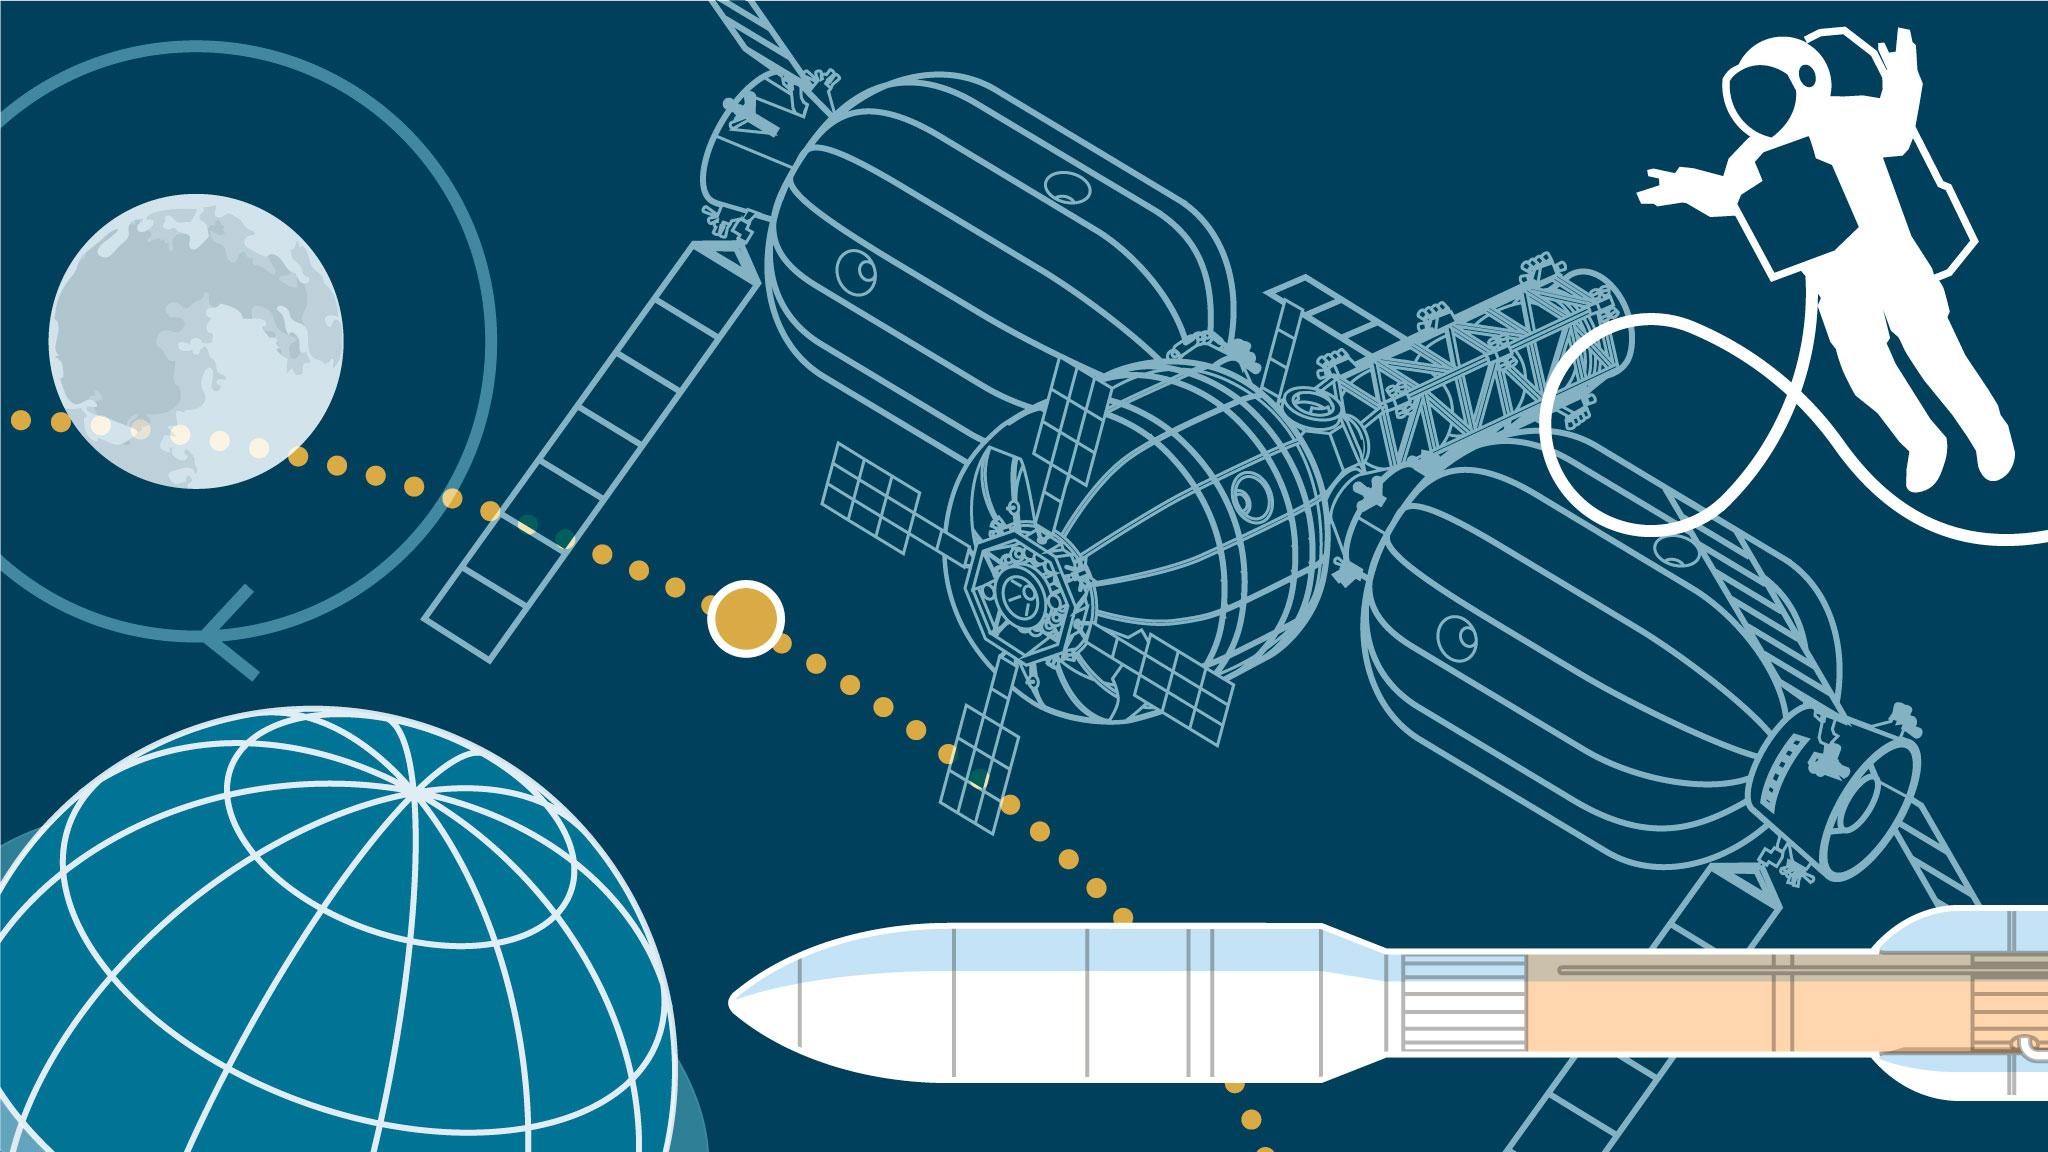 2020: A Space Station odyssey